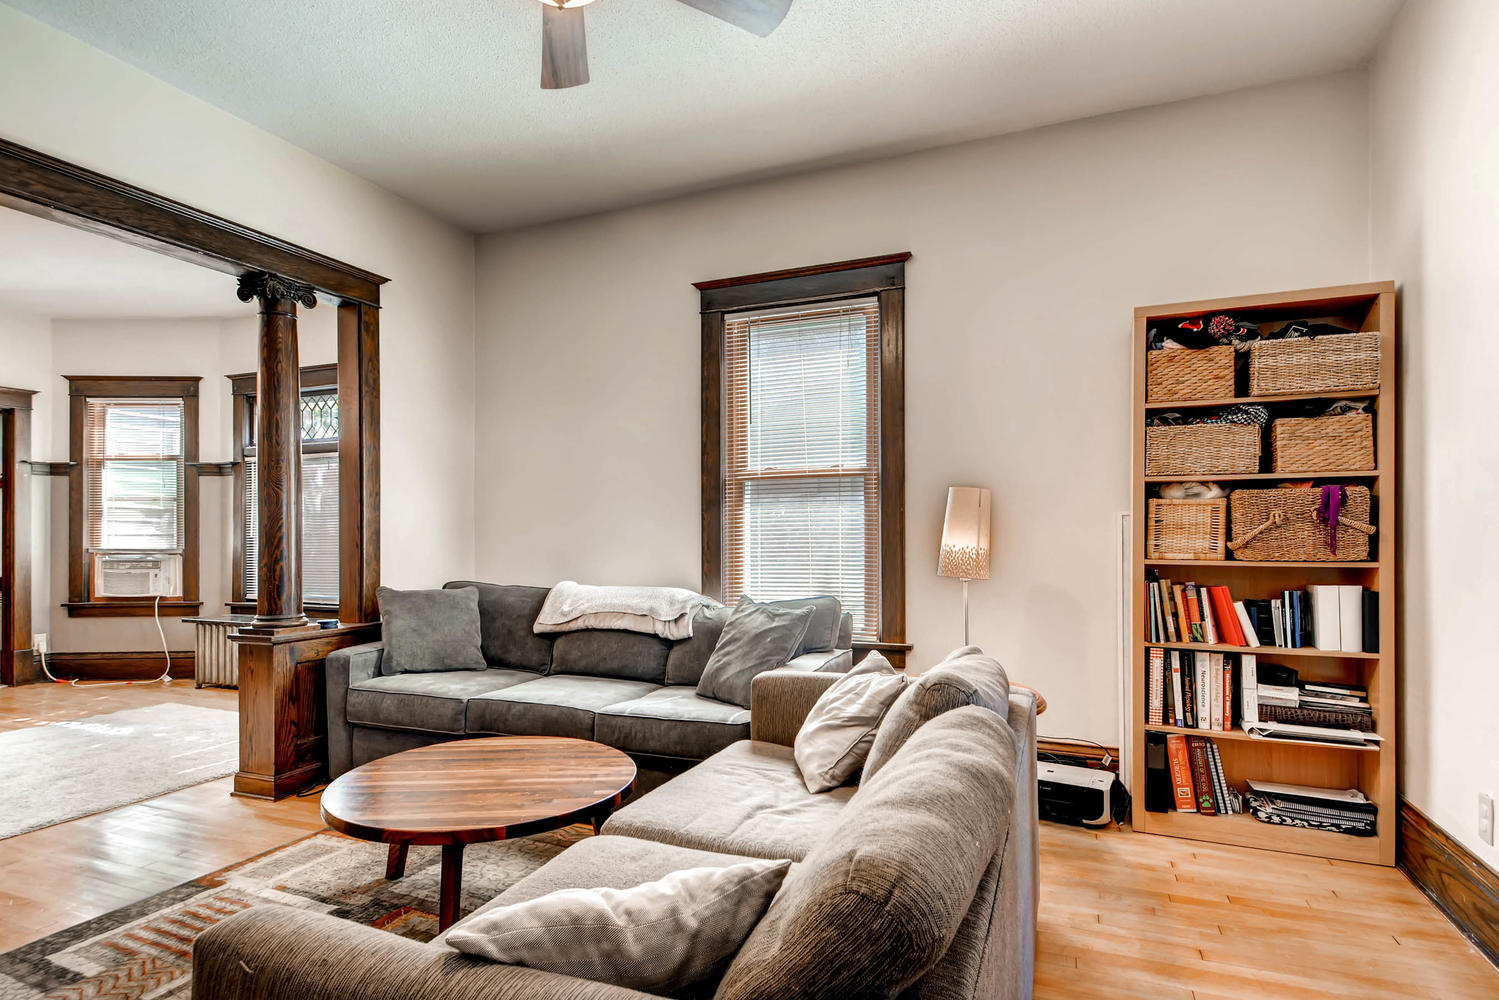 1121 Washington St NE-large-005-17-Living Room-1500x1000-72dpi.jpg